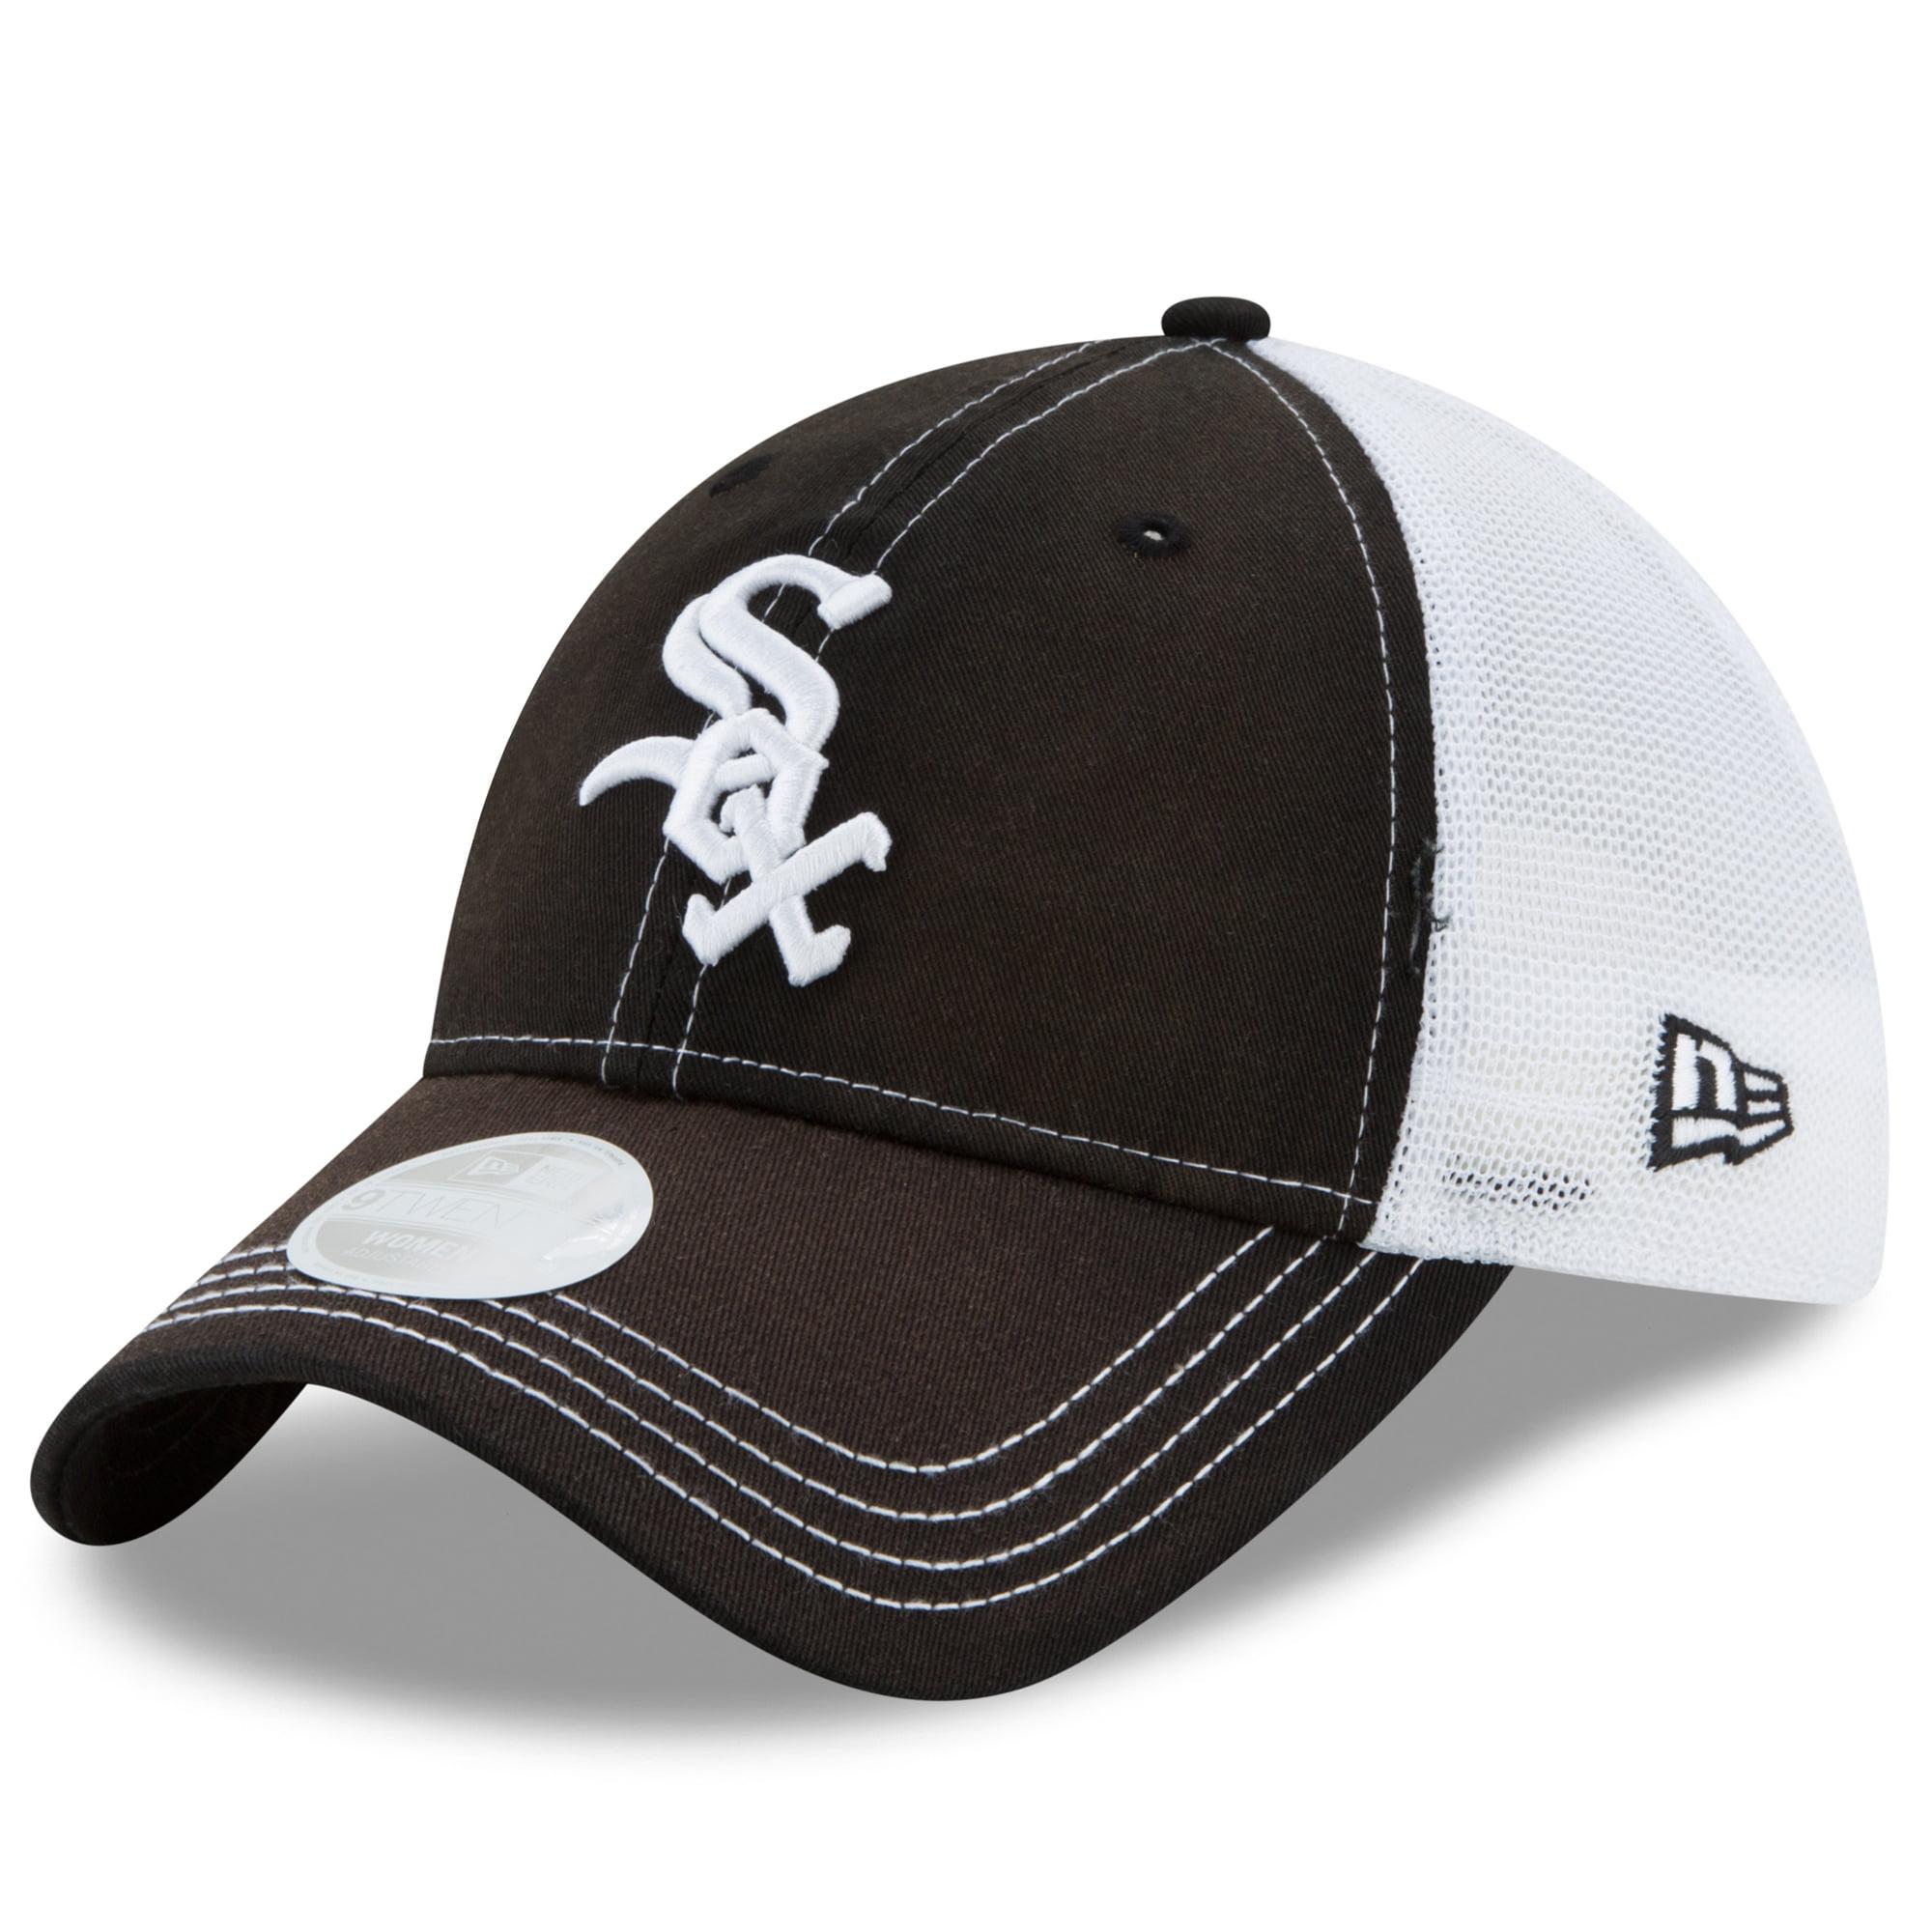 Chicago White Sox New Era Women's Spirited 9TWENTY Adjustable Hat - Black/White - OSFA